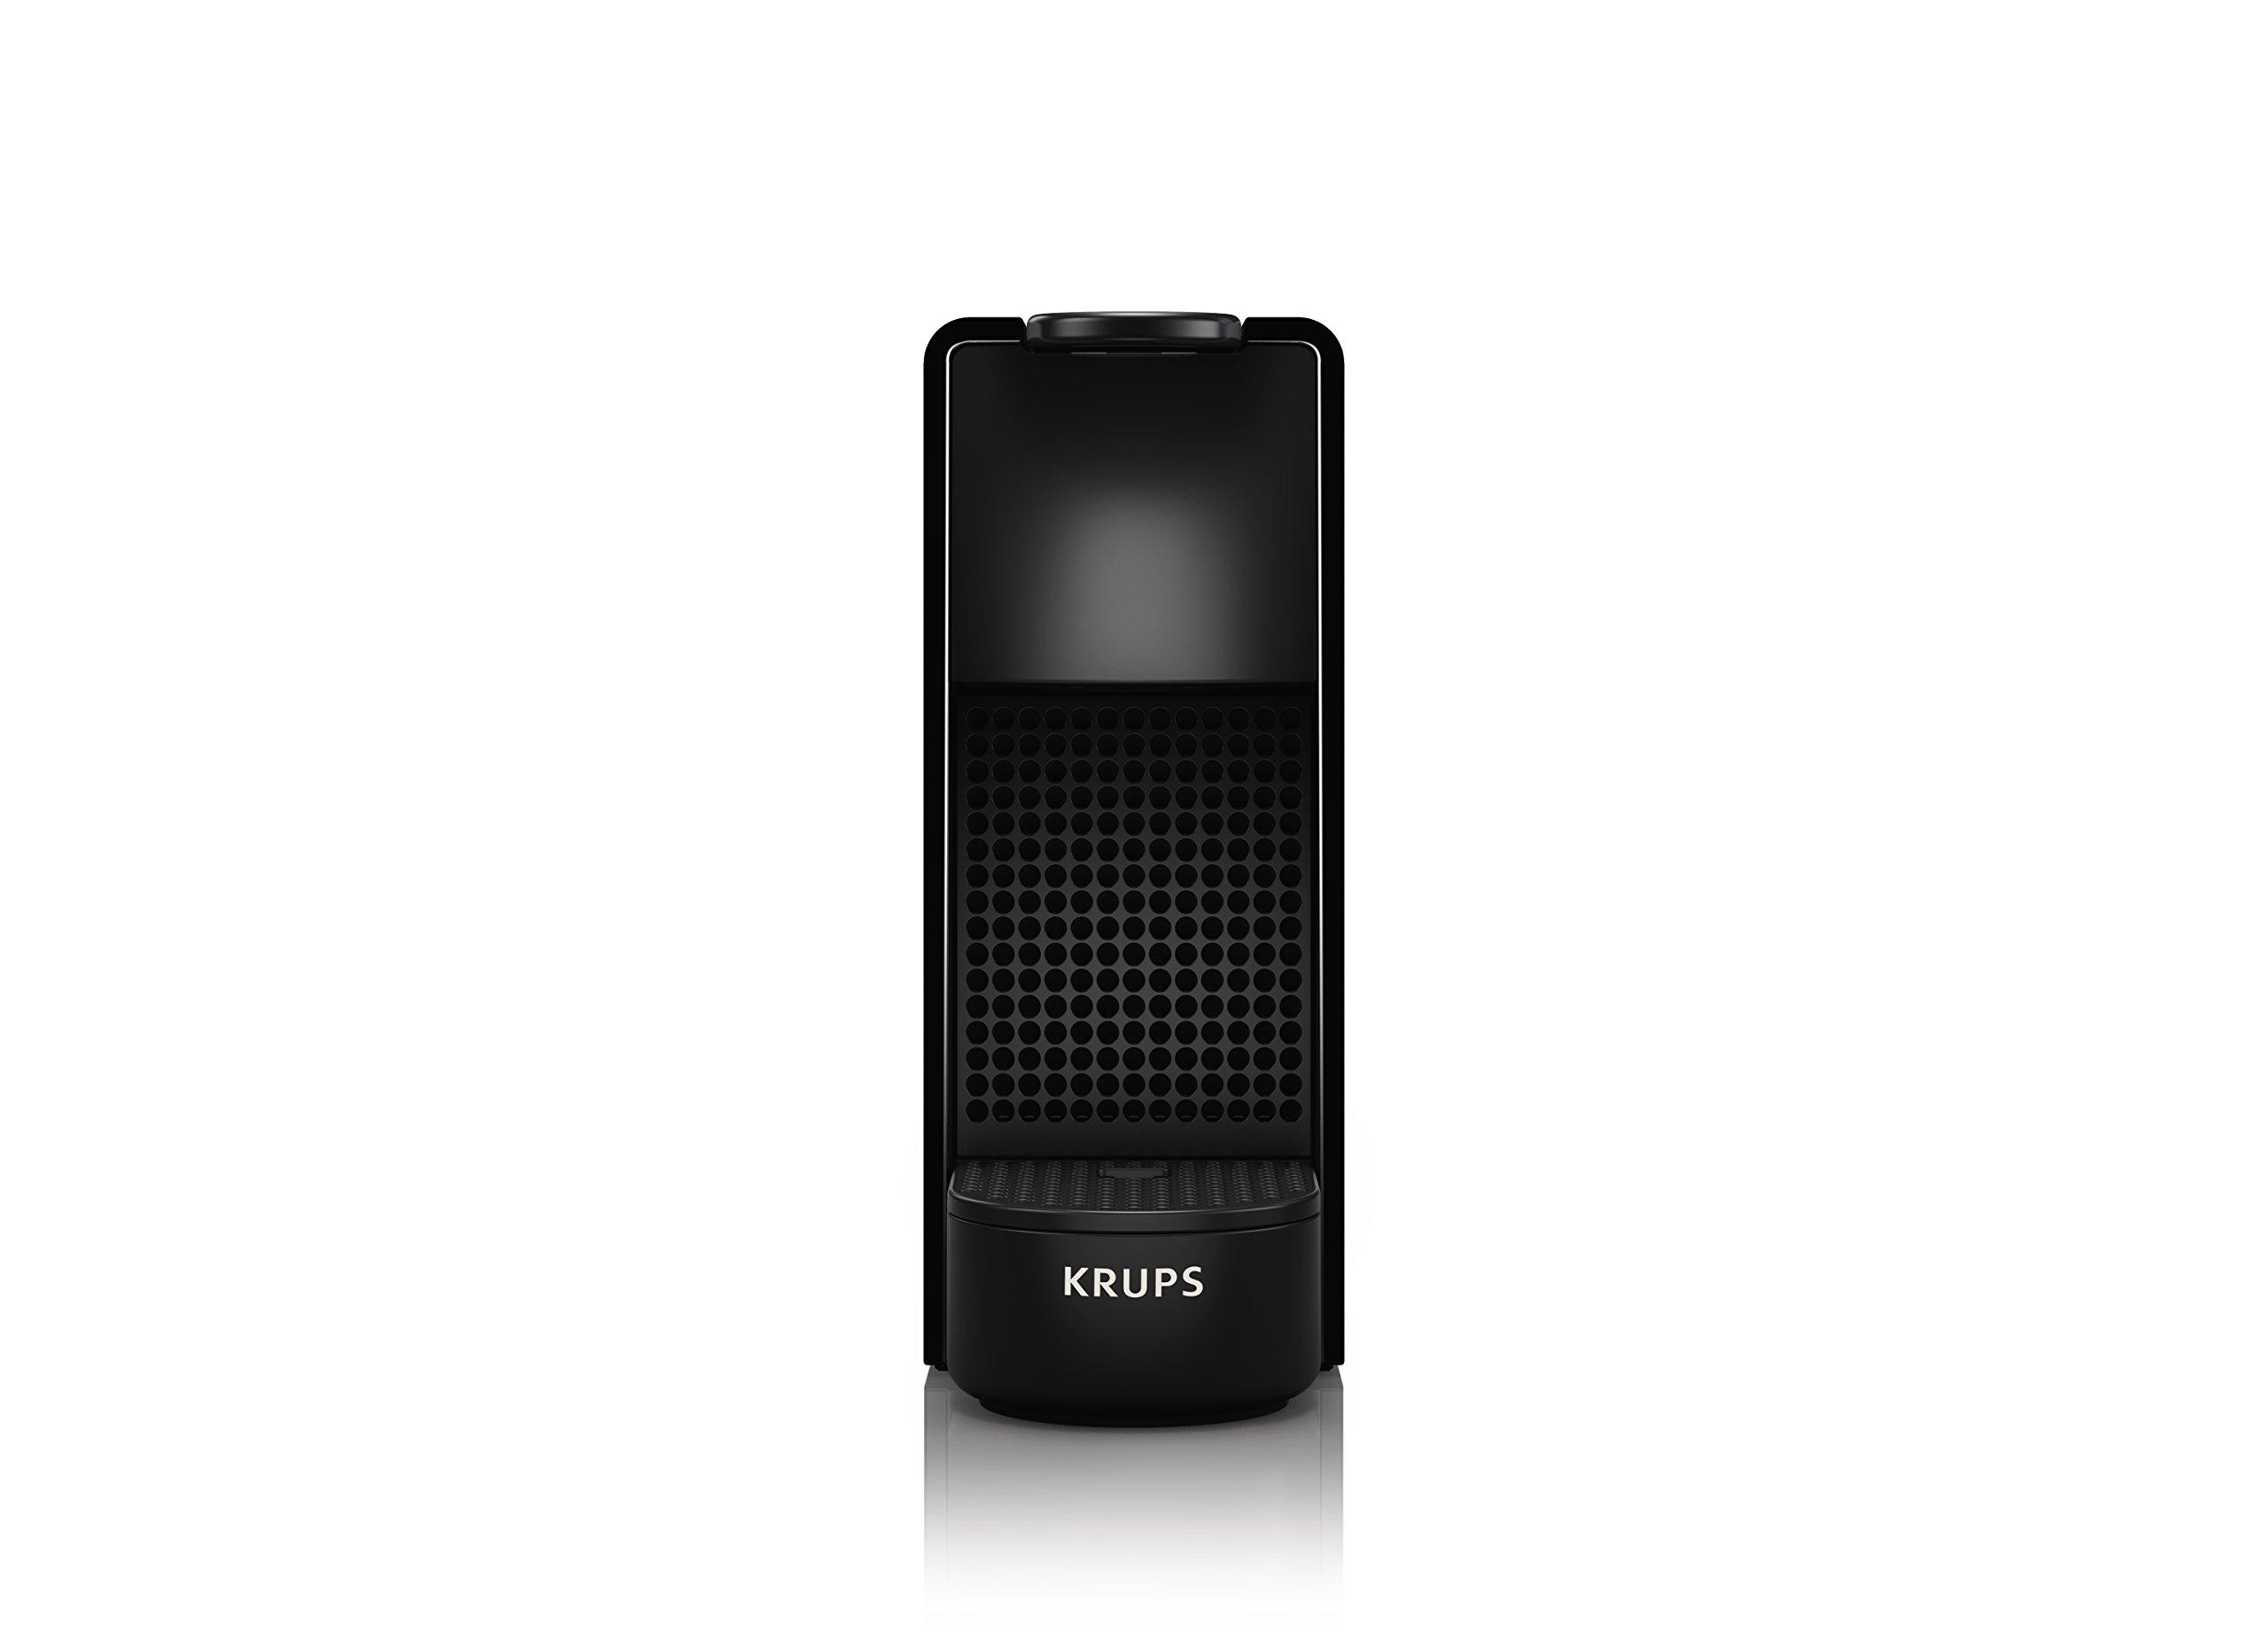 71ww9j4sBHL - Krups Nespresso XN1108 Essenza Mini coffee capsule machine, 1260 watts, black, 0.6 liters